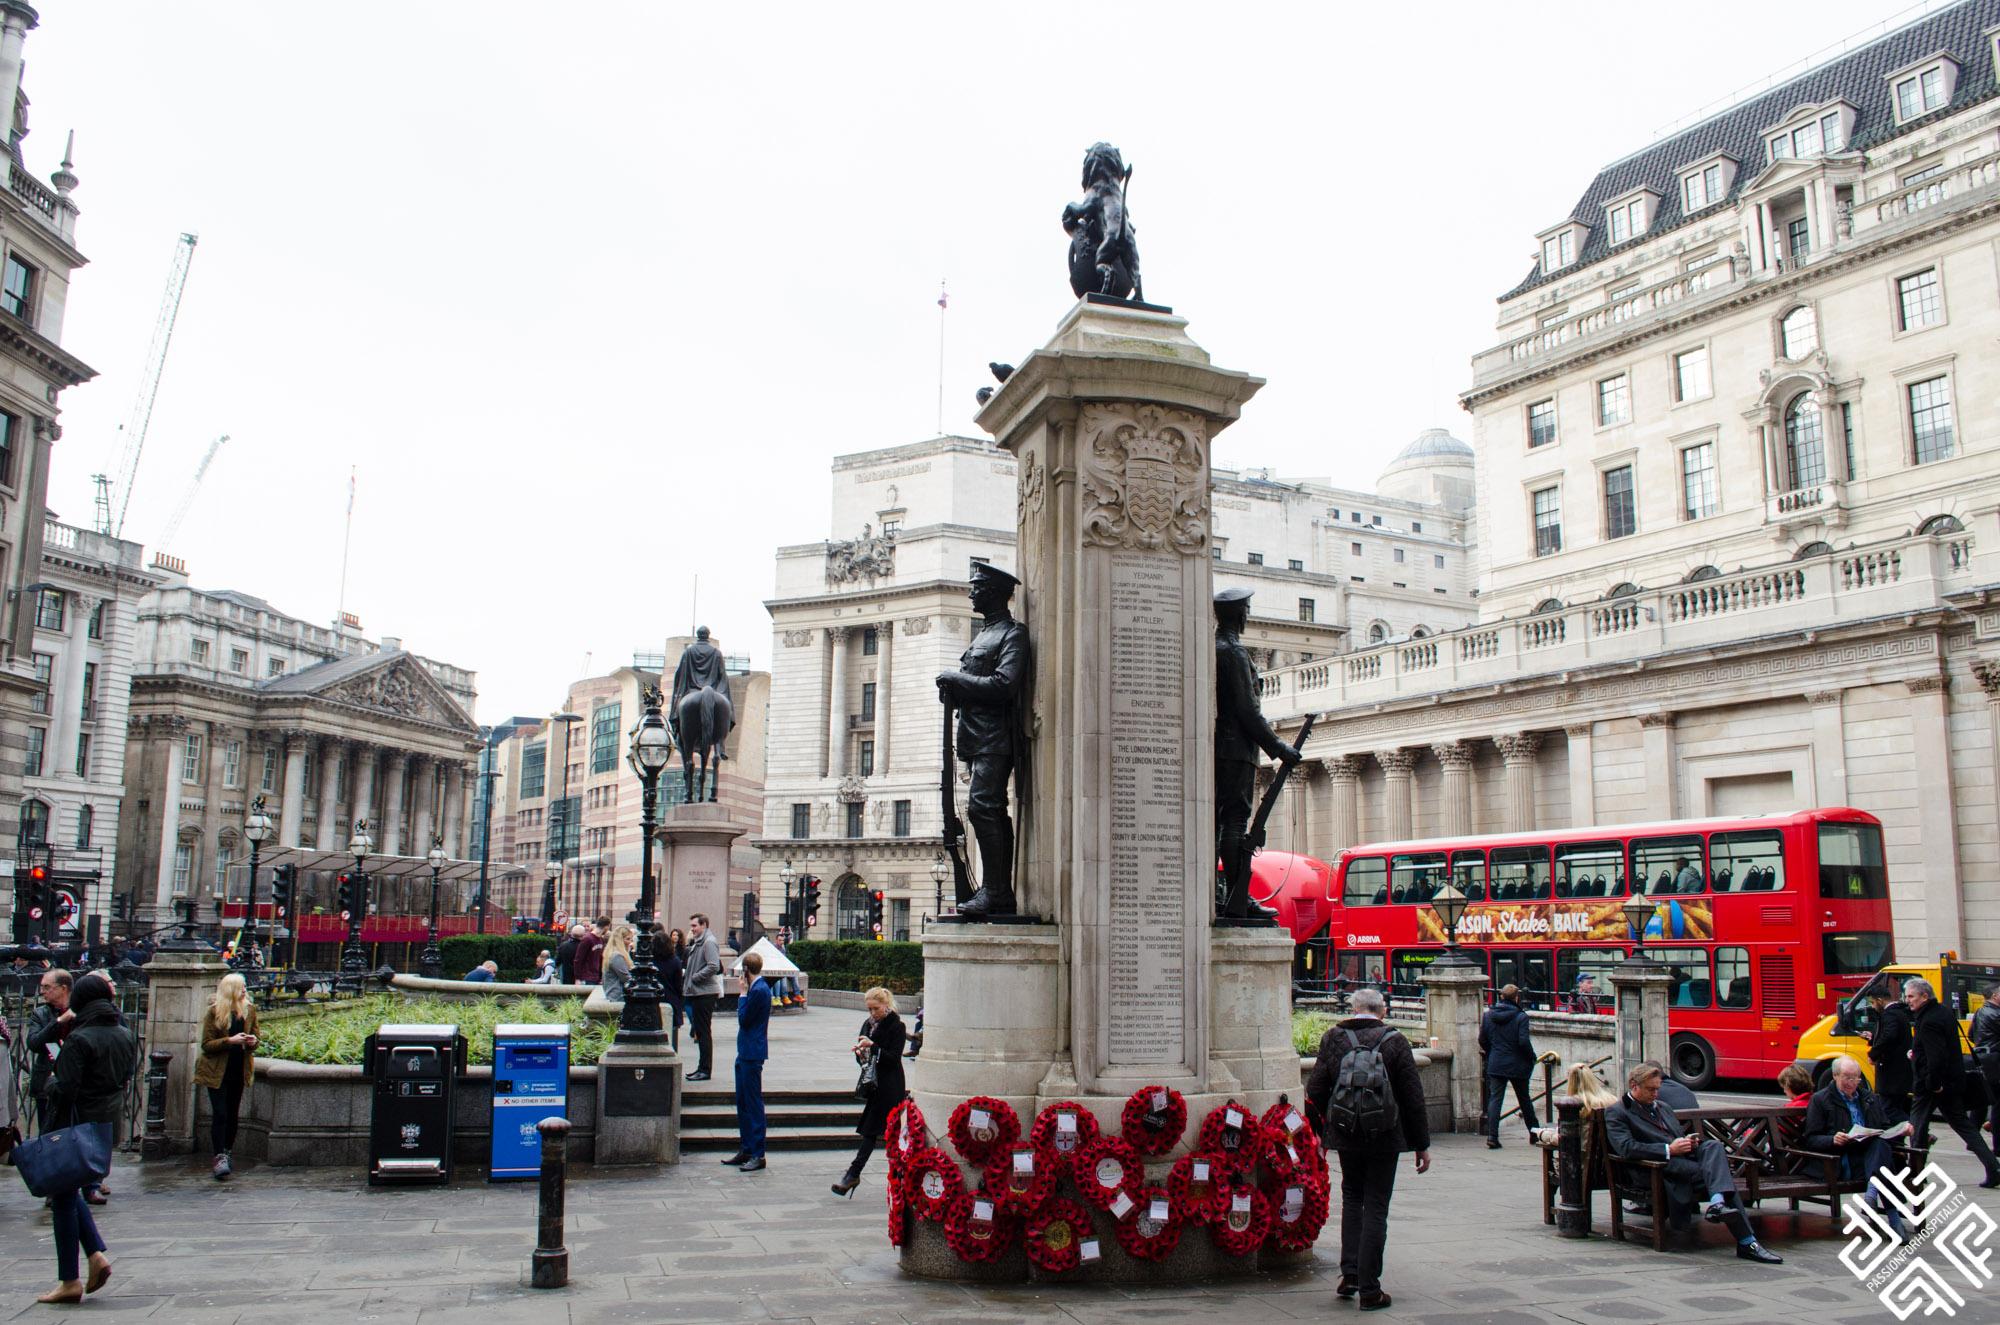 blue-badge-guide-city-of-london-tour-32